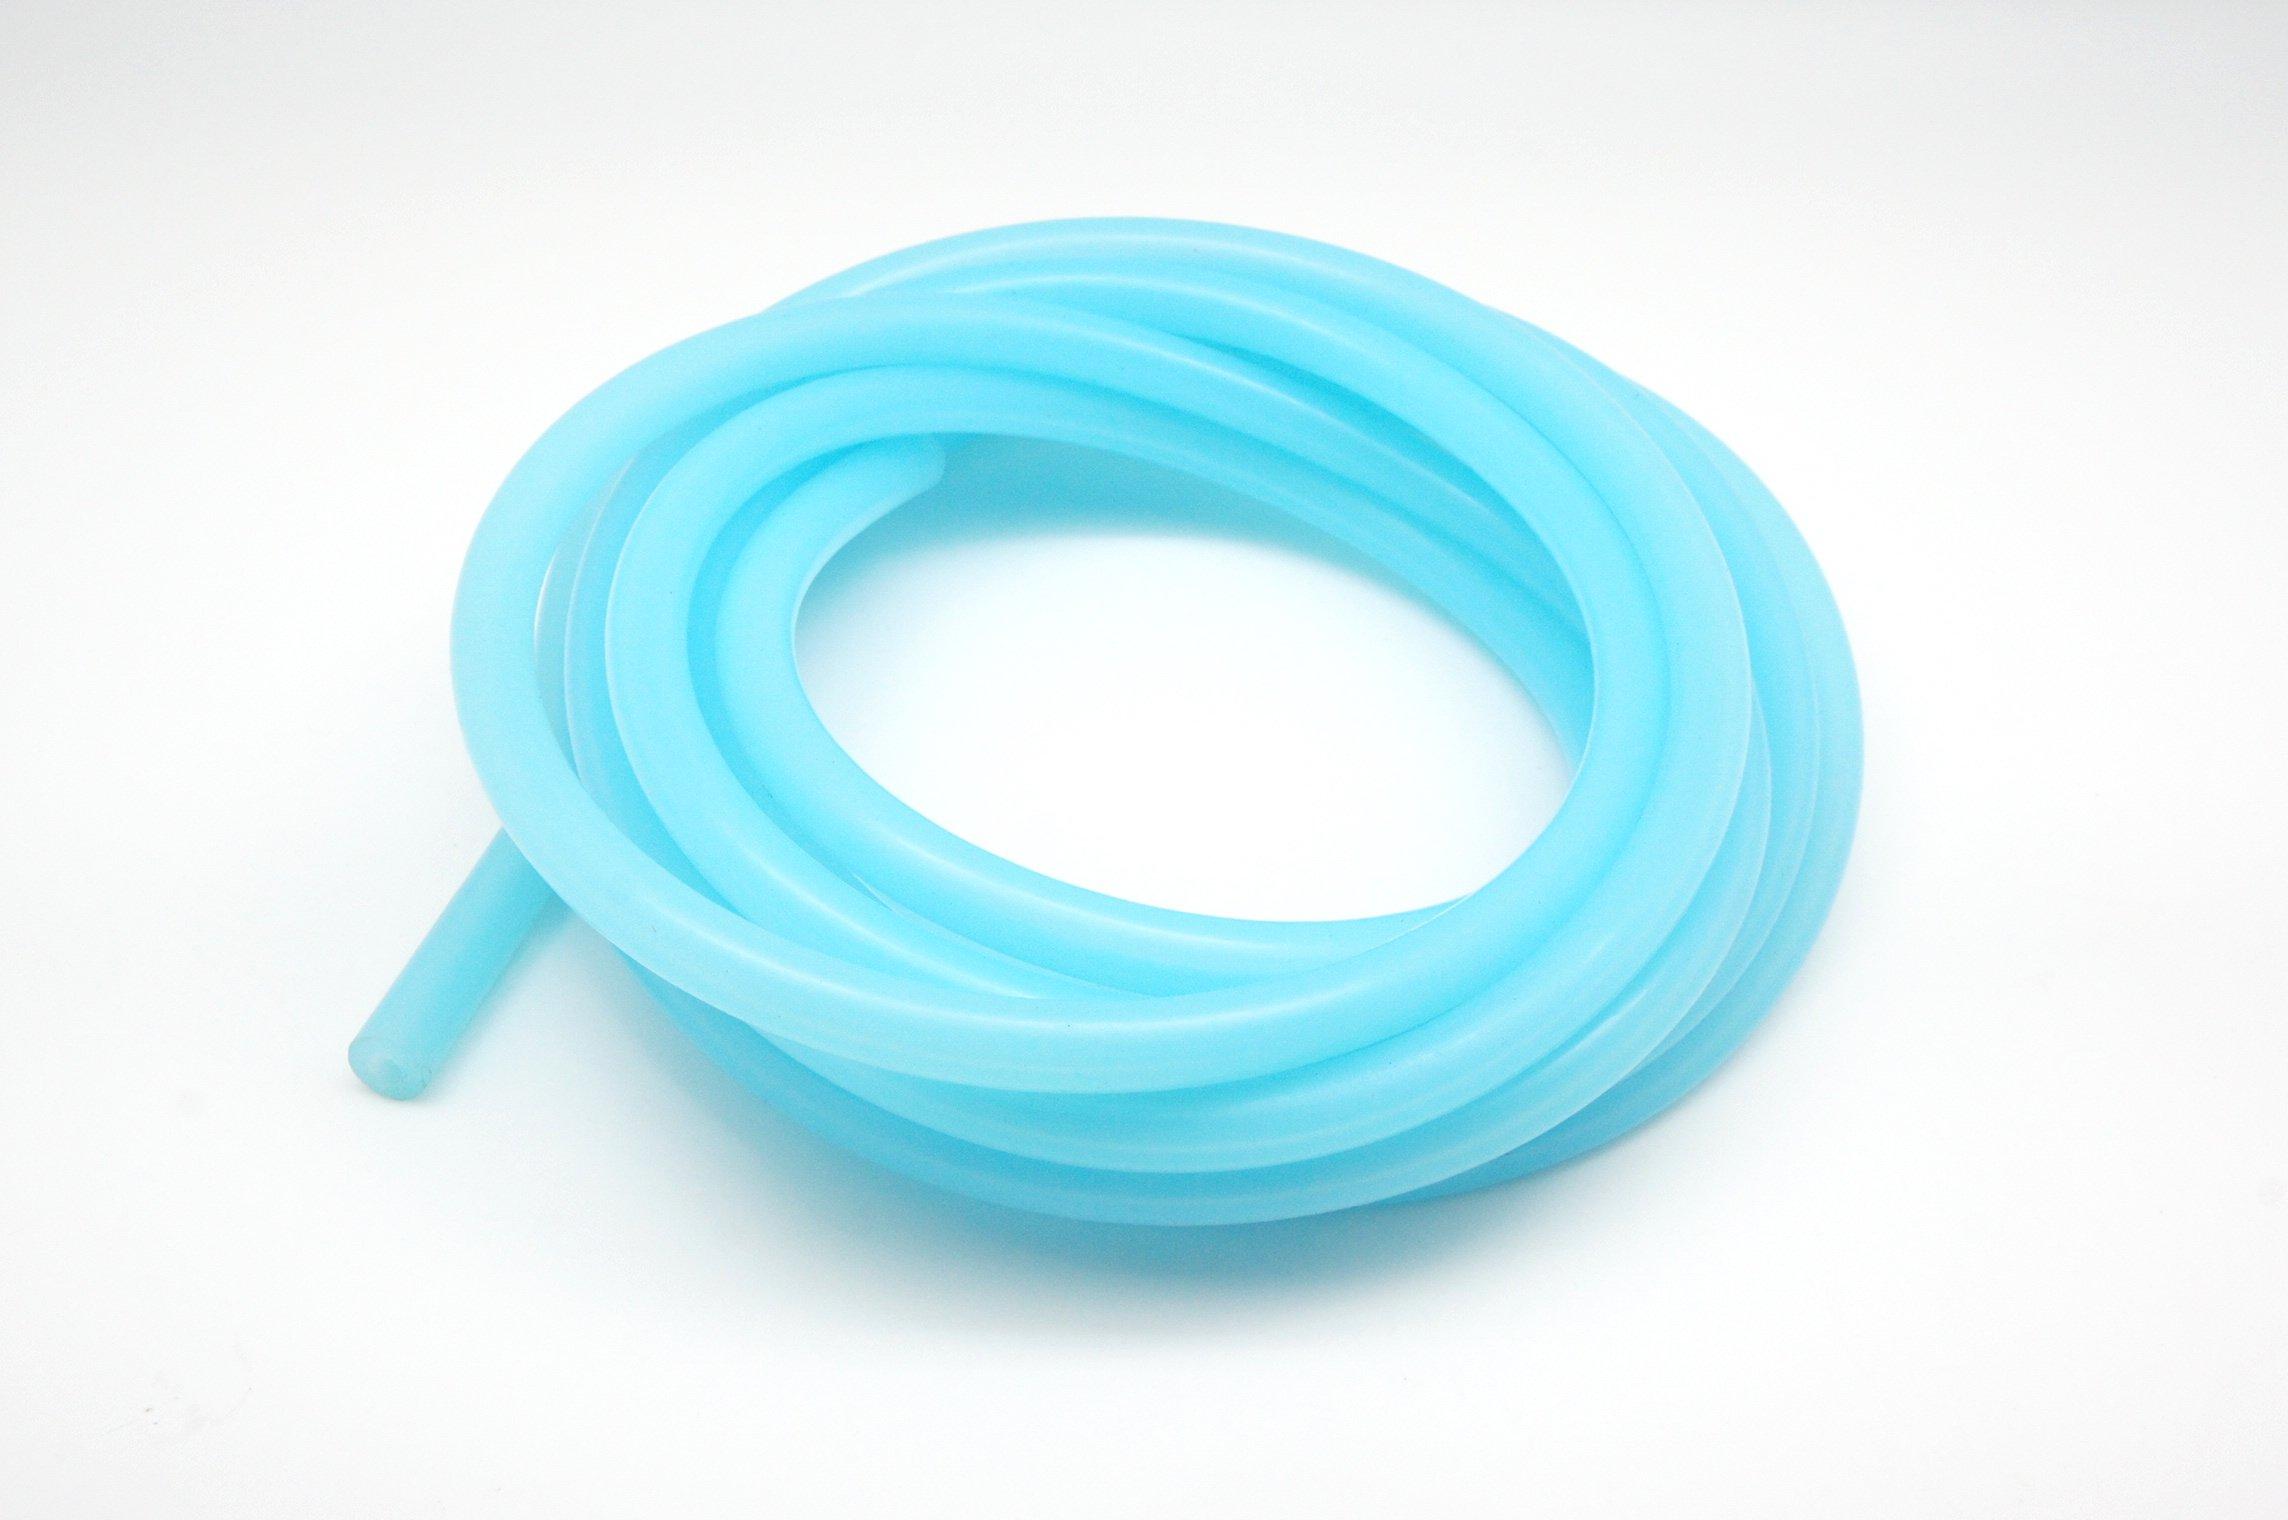 4.5 Meter Autobahn88 High Performance Silicone Vacuum Hose 6mm Blue OD 0.24 ID 0.08 2mm 15 Feet per reel